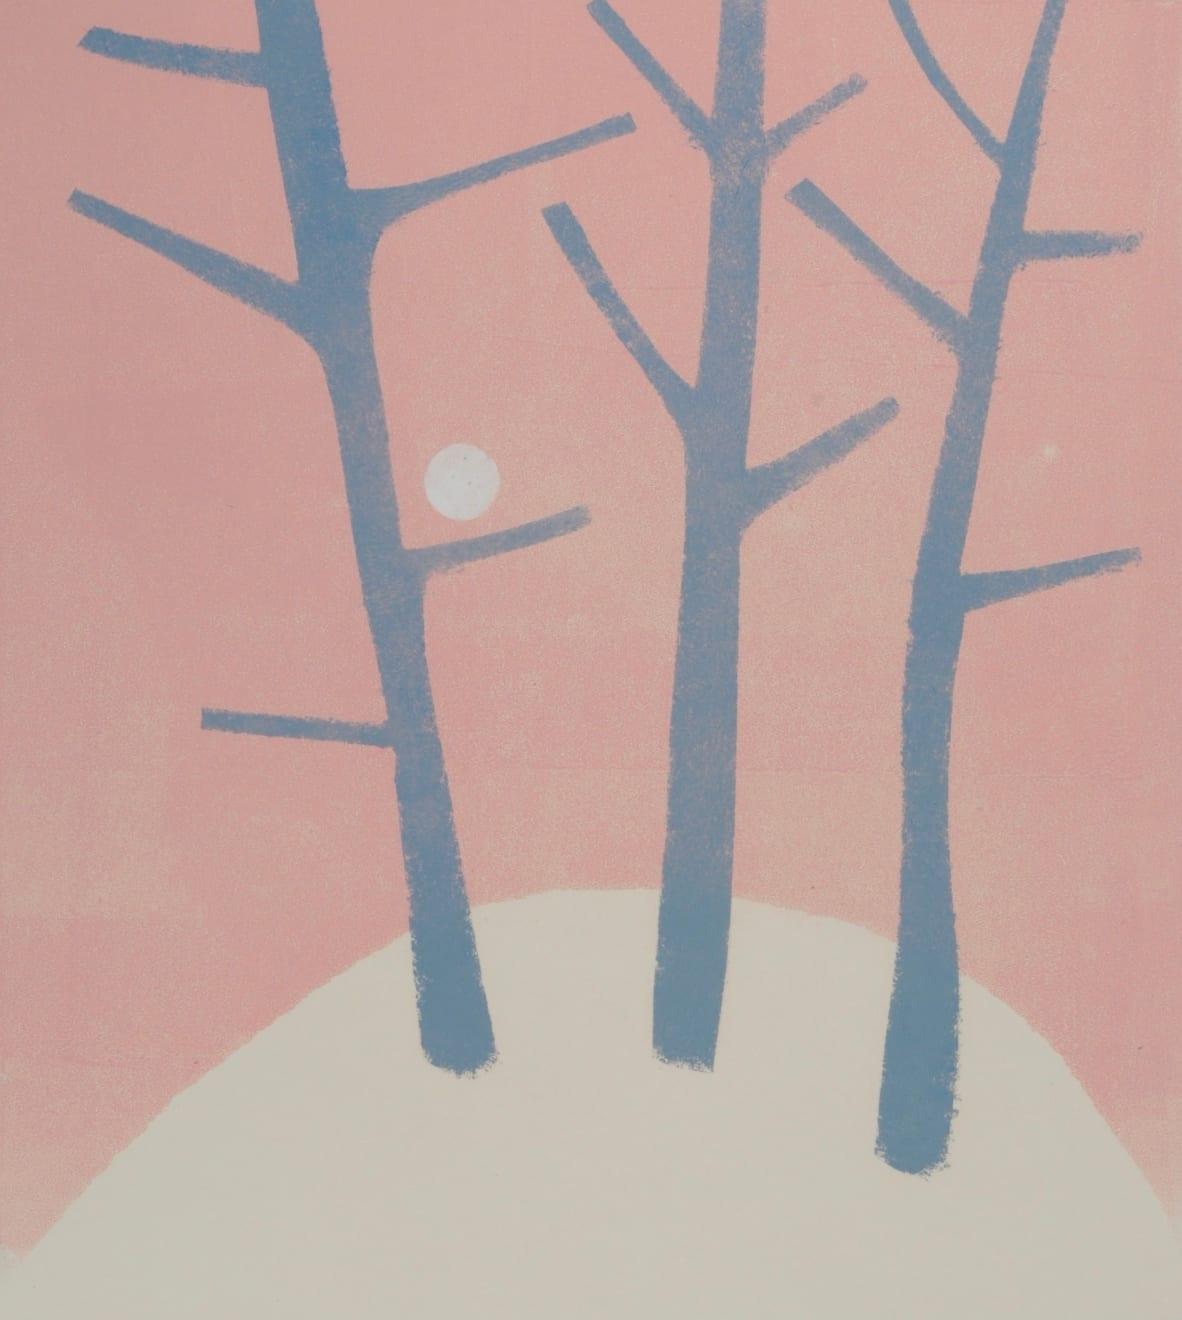 Nigel Swift, First Snow, 2020